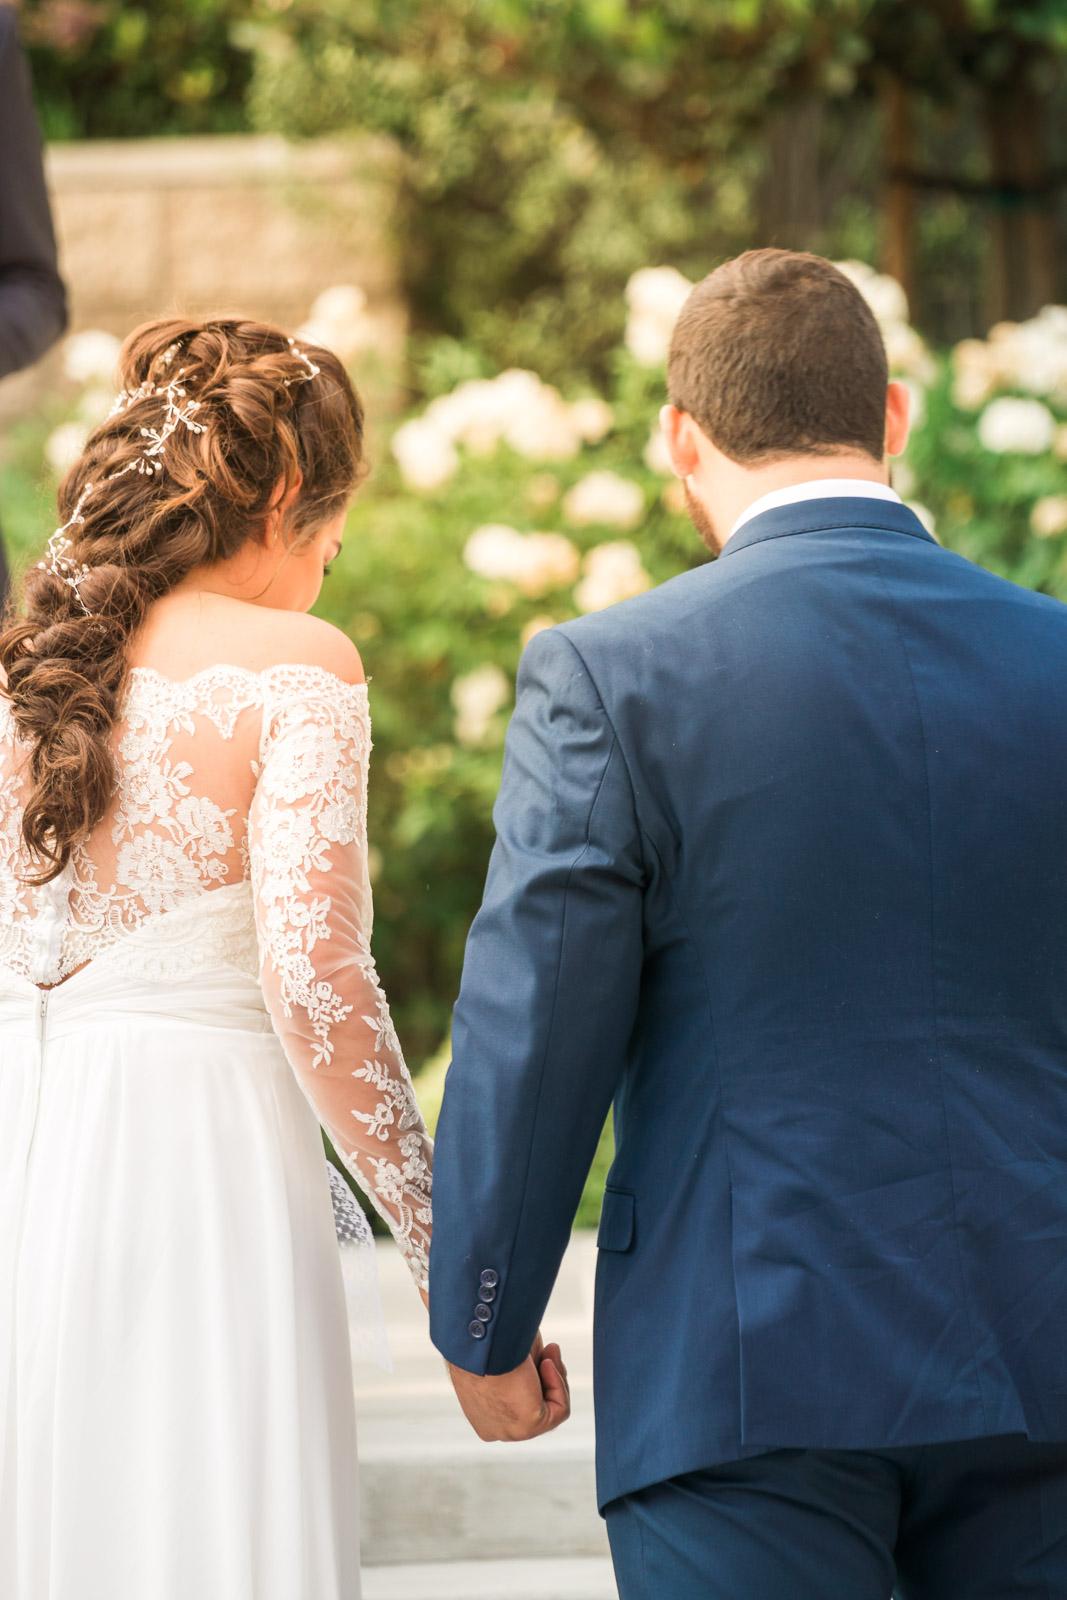 157_Angel-Brea-Orange-County_Joseph-Barber-Wedding-Photography.jpg